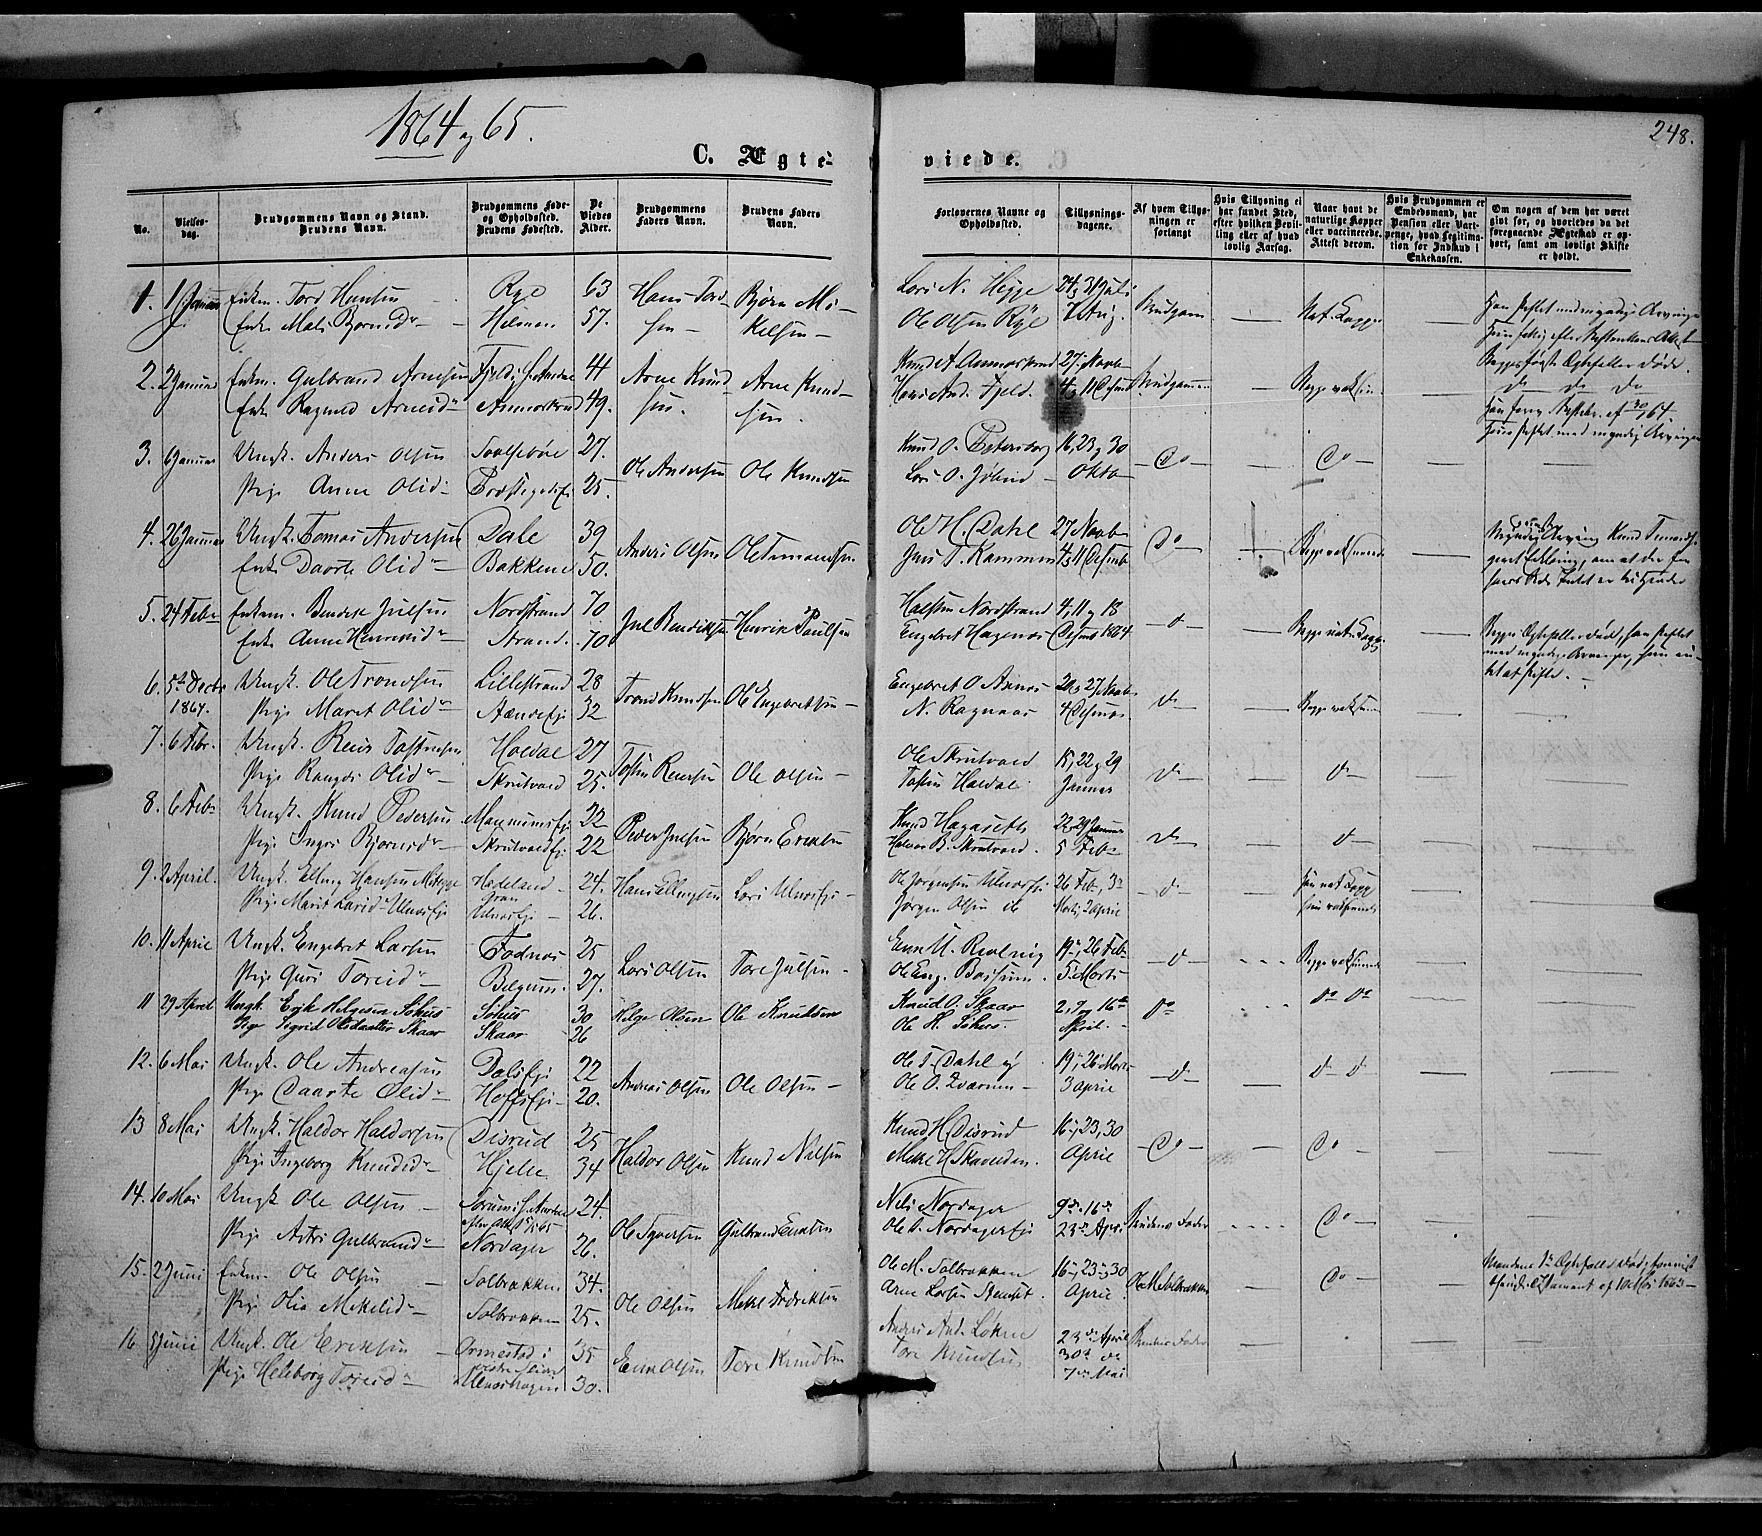 SAH, Nord-Aurdal prestekontor, Ministerialbok nr. 8, 1863-1875, s. 248